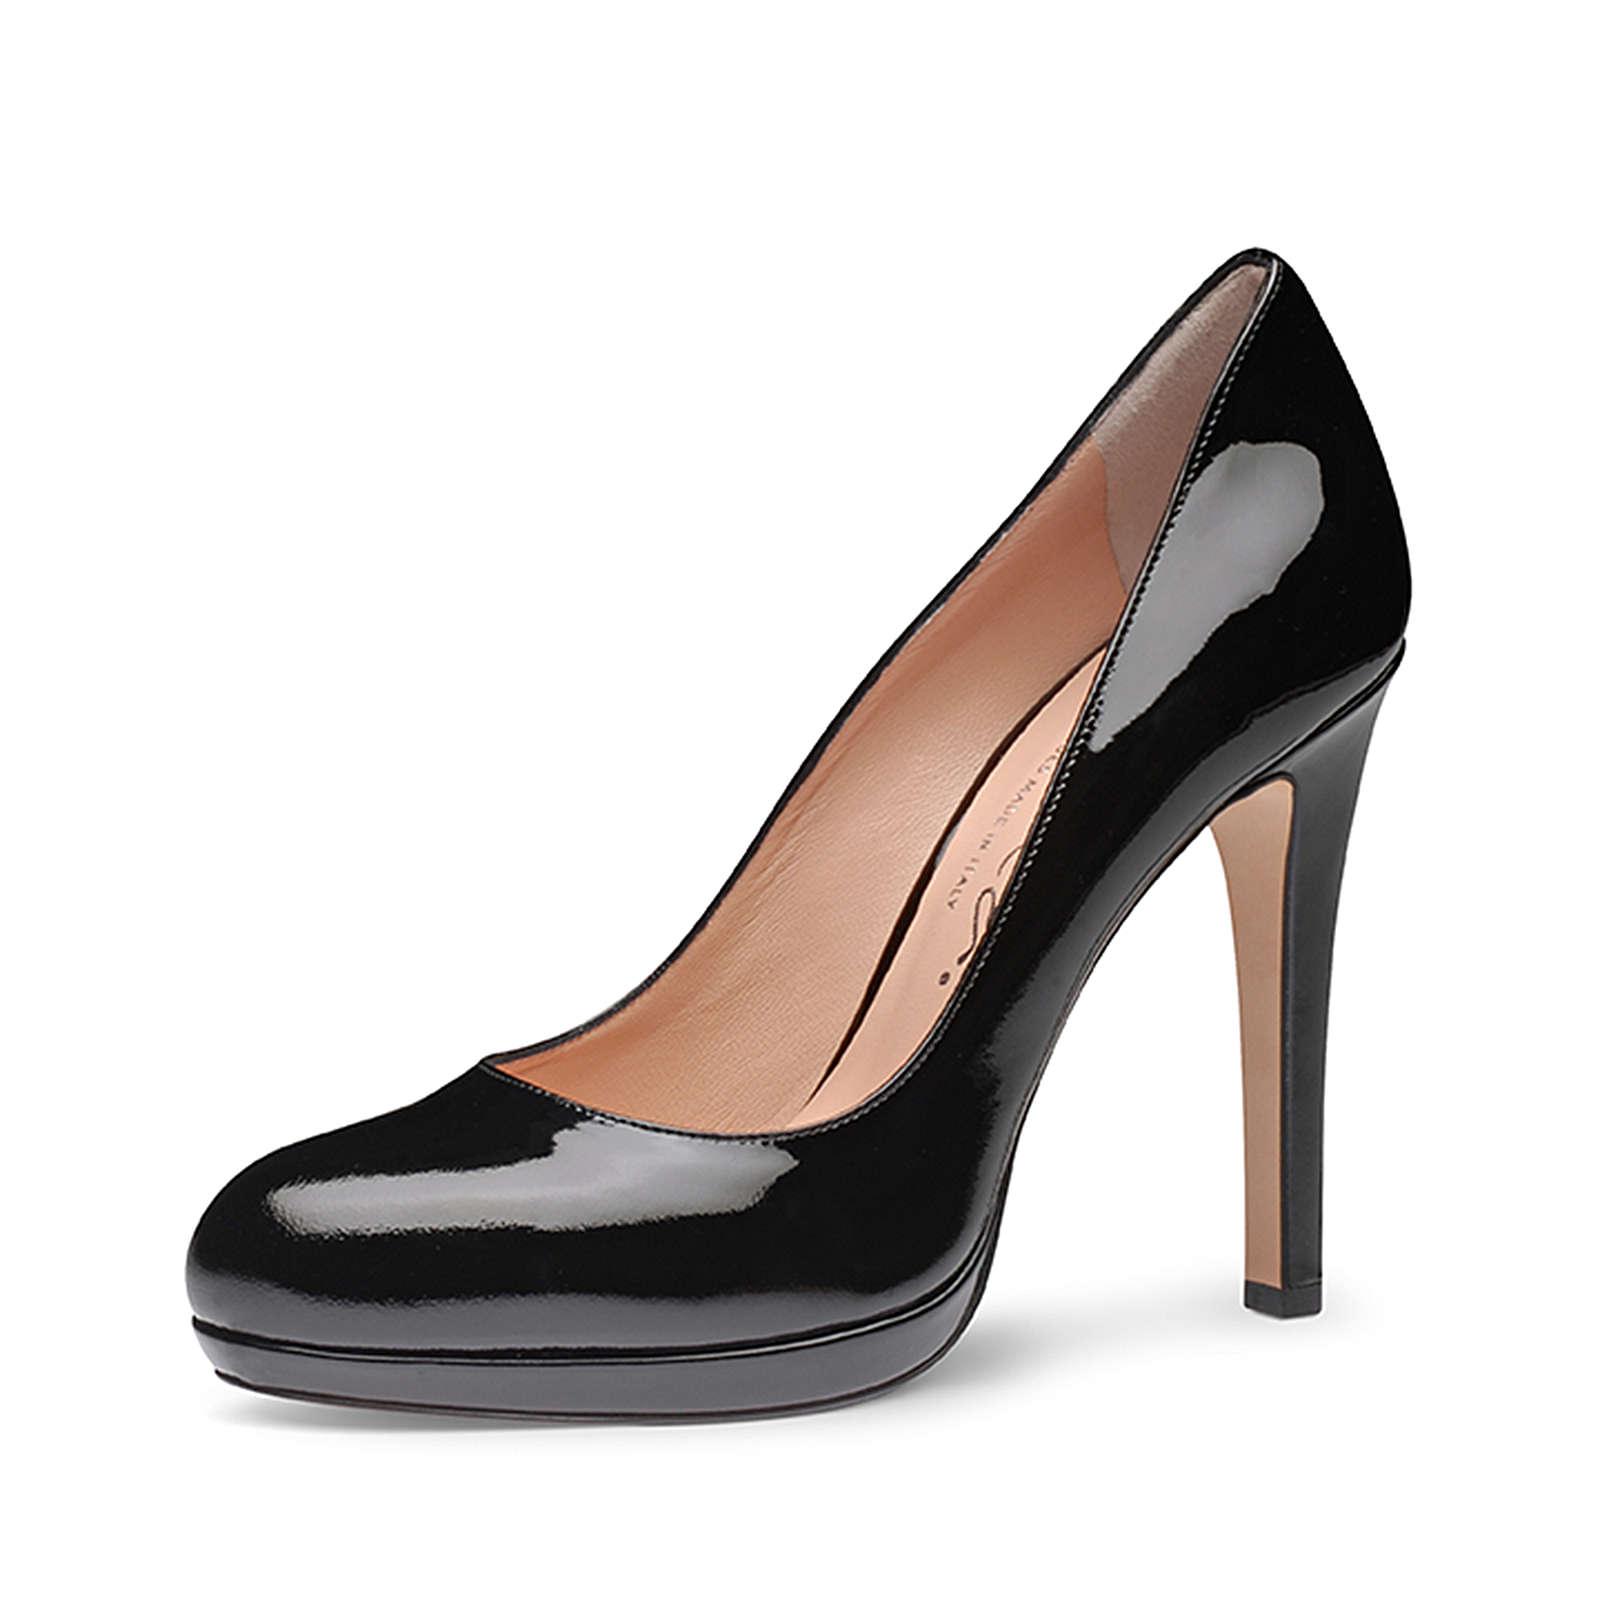 Evita Shoes Pumps schwarz Damen Gr. 34